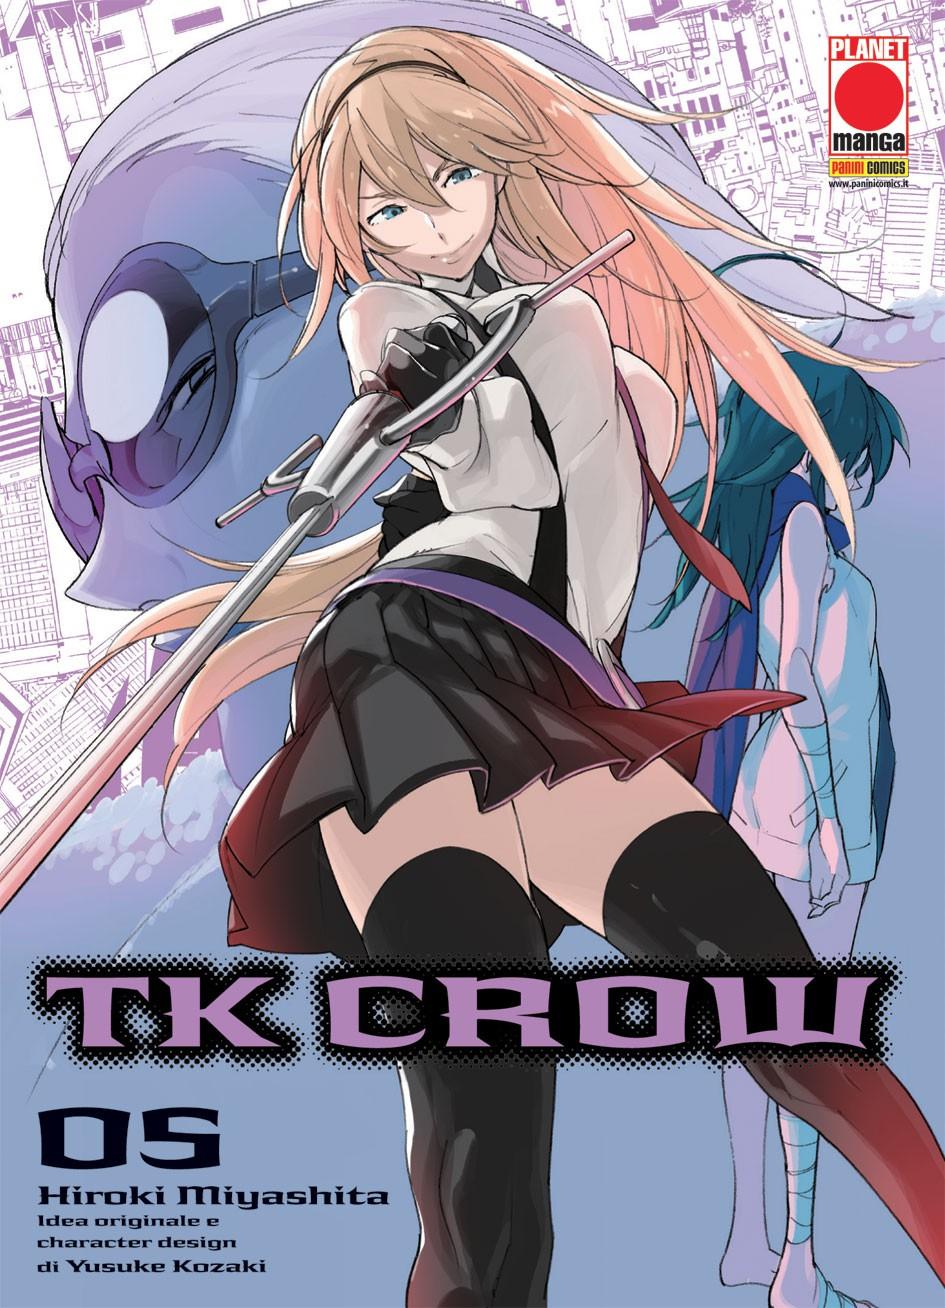 TK Crow vol. 5